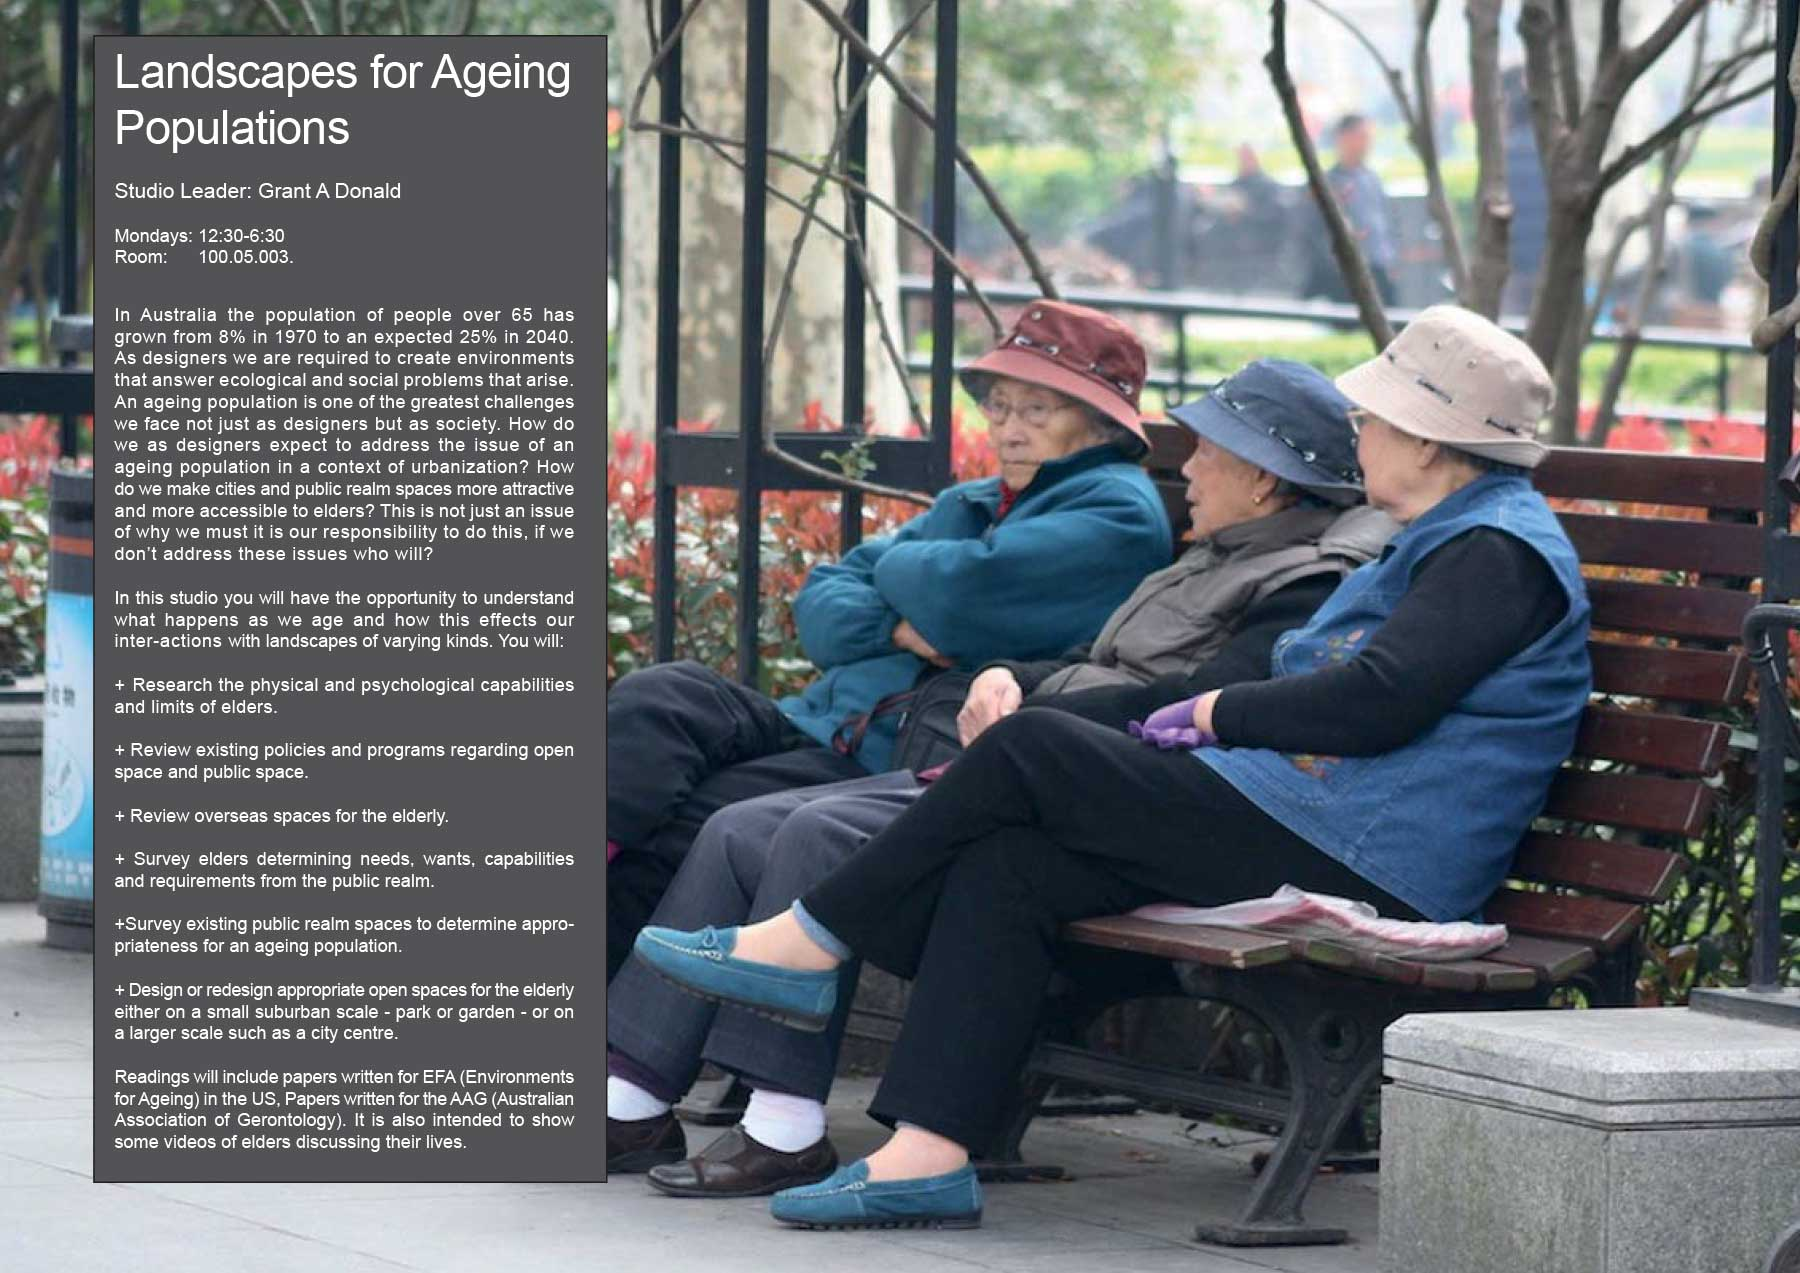 Landscapes-for-Aging-populations_poster-draft2.jpg